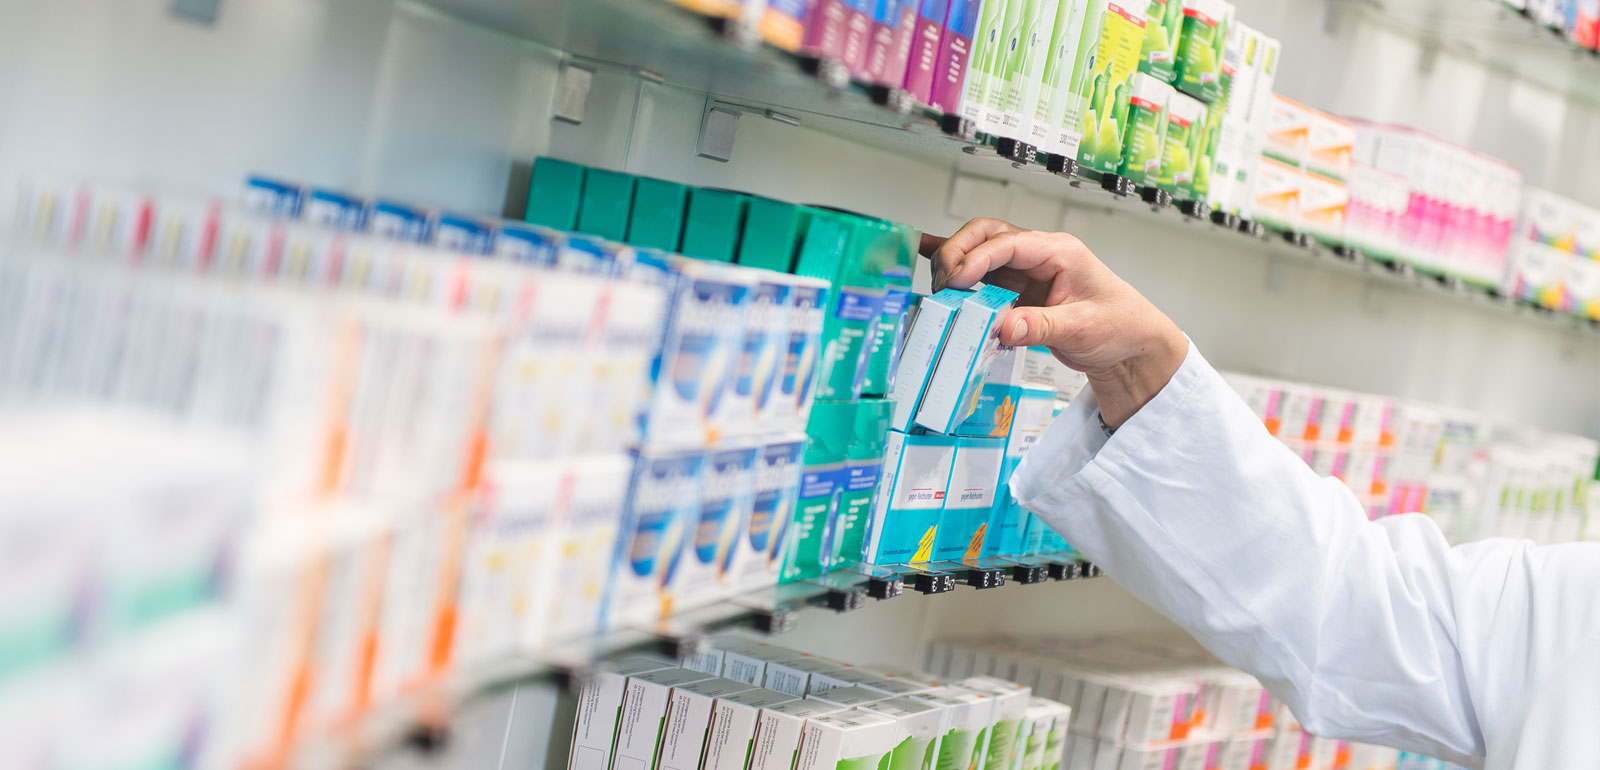 ApoRisk® Apothekenabgabe | Apothekennachfolge-Regelung | www.pharmarisk.de | Deutschland | Das Lebenswerk Apotheke - Das Lebenswerk mit den besten Chancen